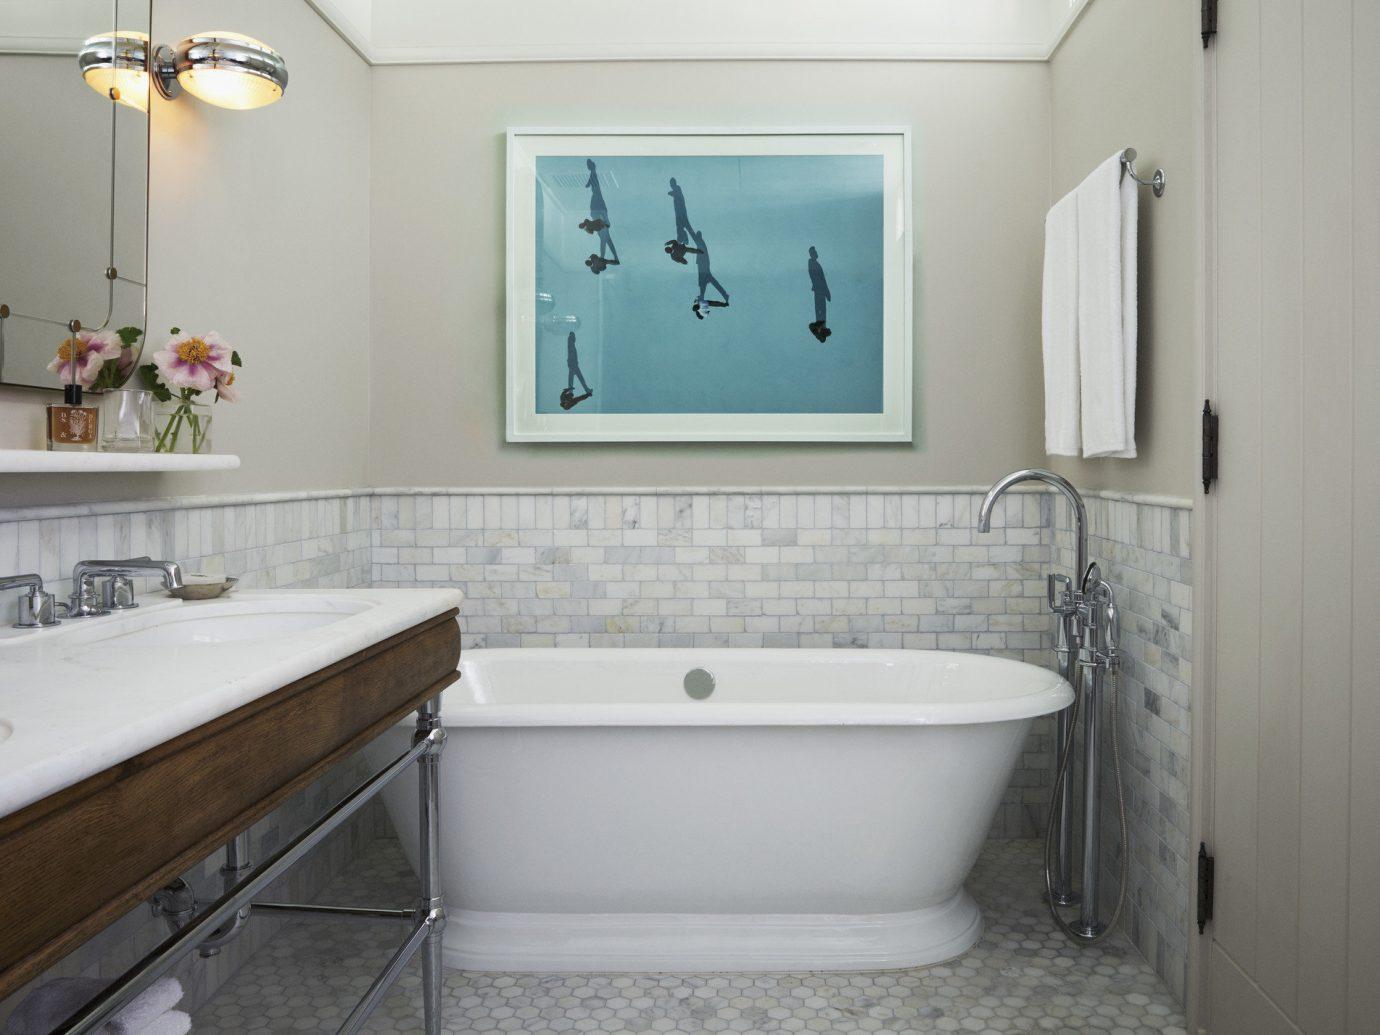 Hotels NYC bathroom wall indoor floor room sink property bathtub plumbing fixture home interior design bidet real estate apartment estate flooring tub tile Bath tiled